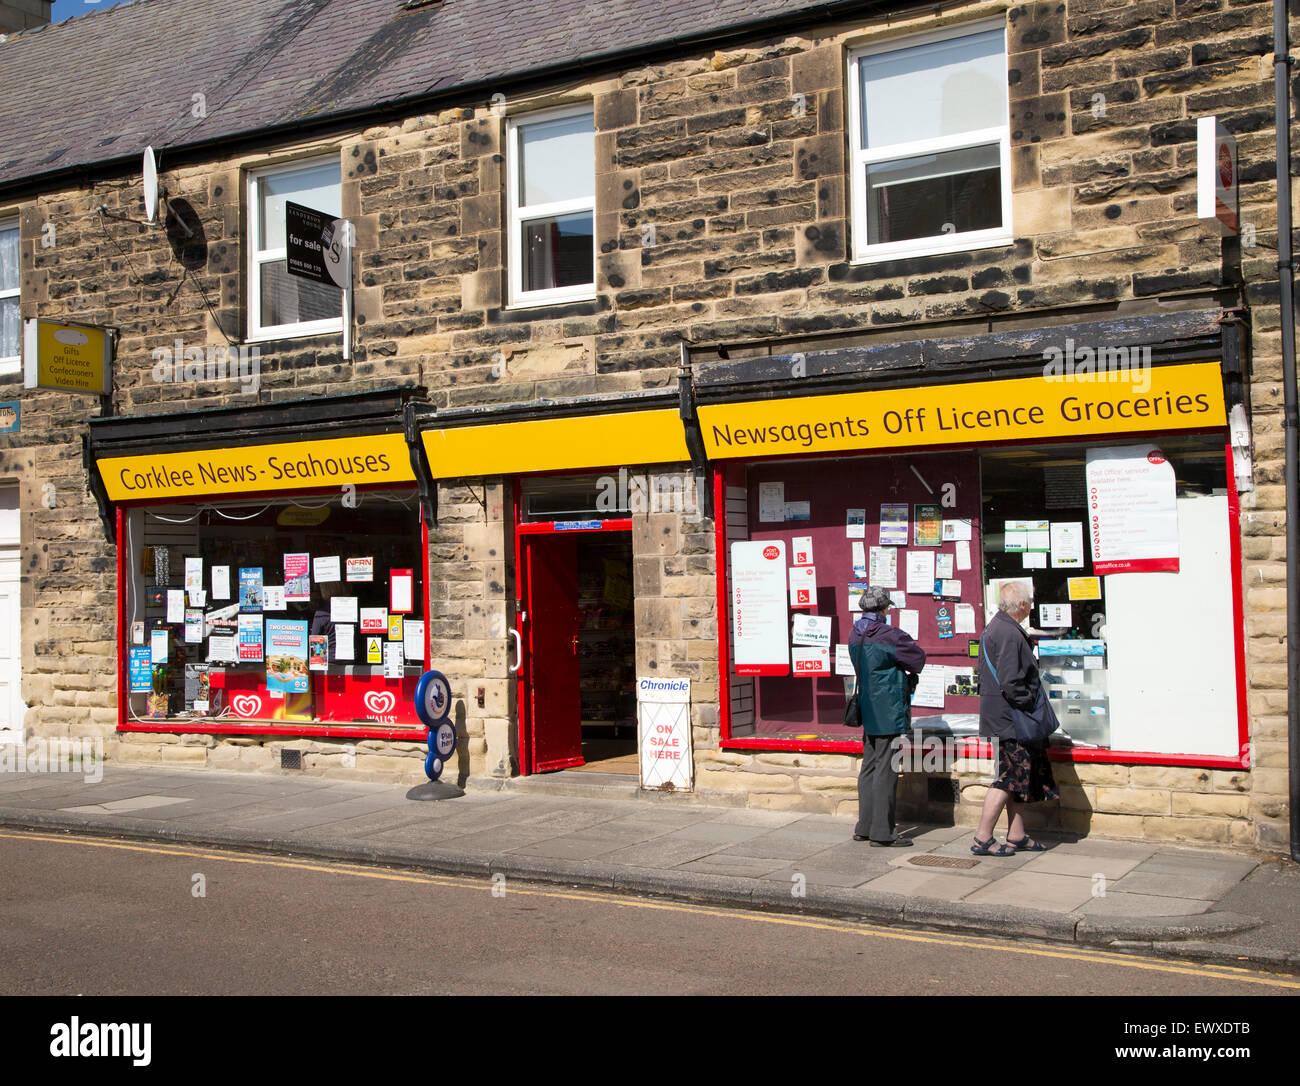 Traditional newsagent shop, Seahouses, Northumberland, England, UK - Stock Image